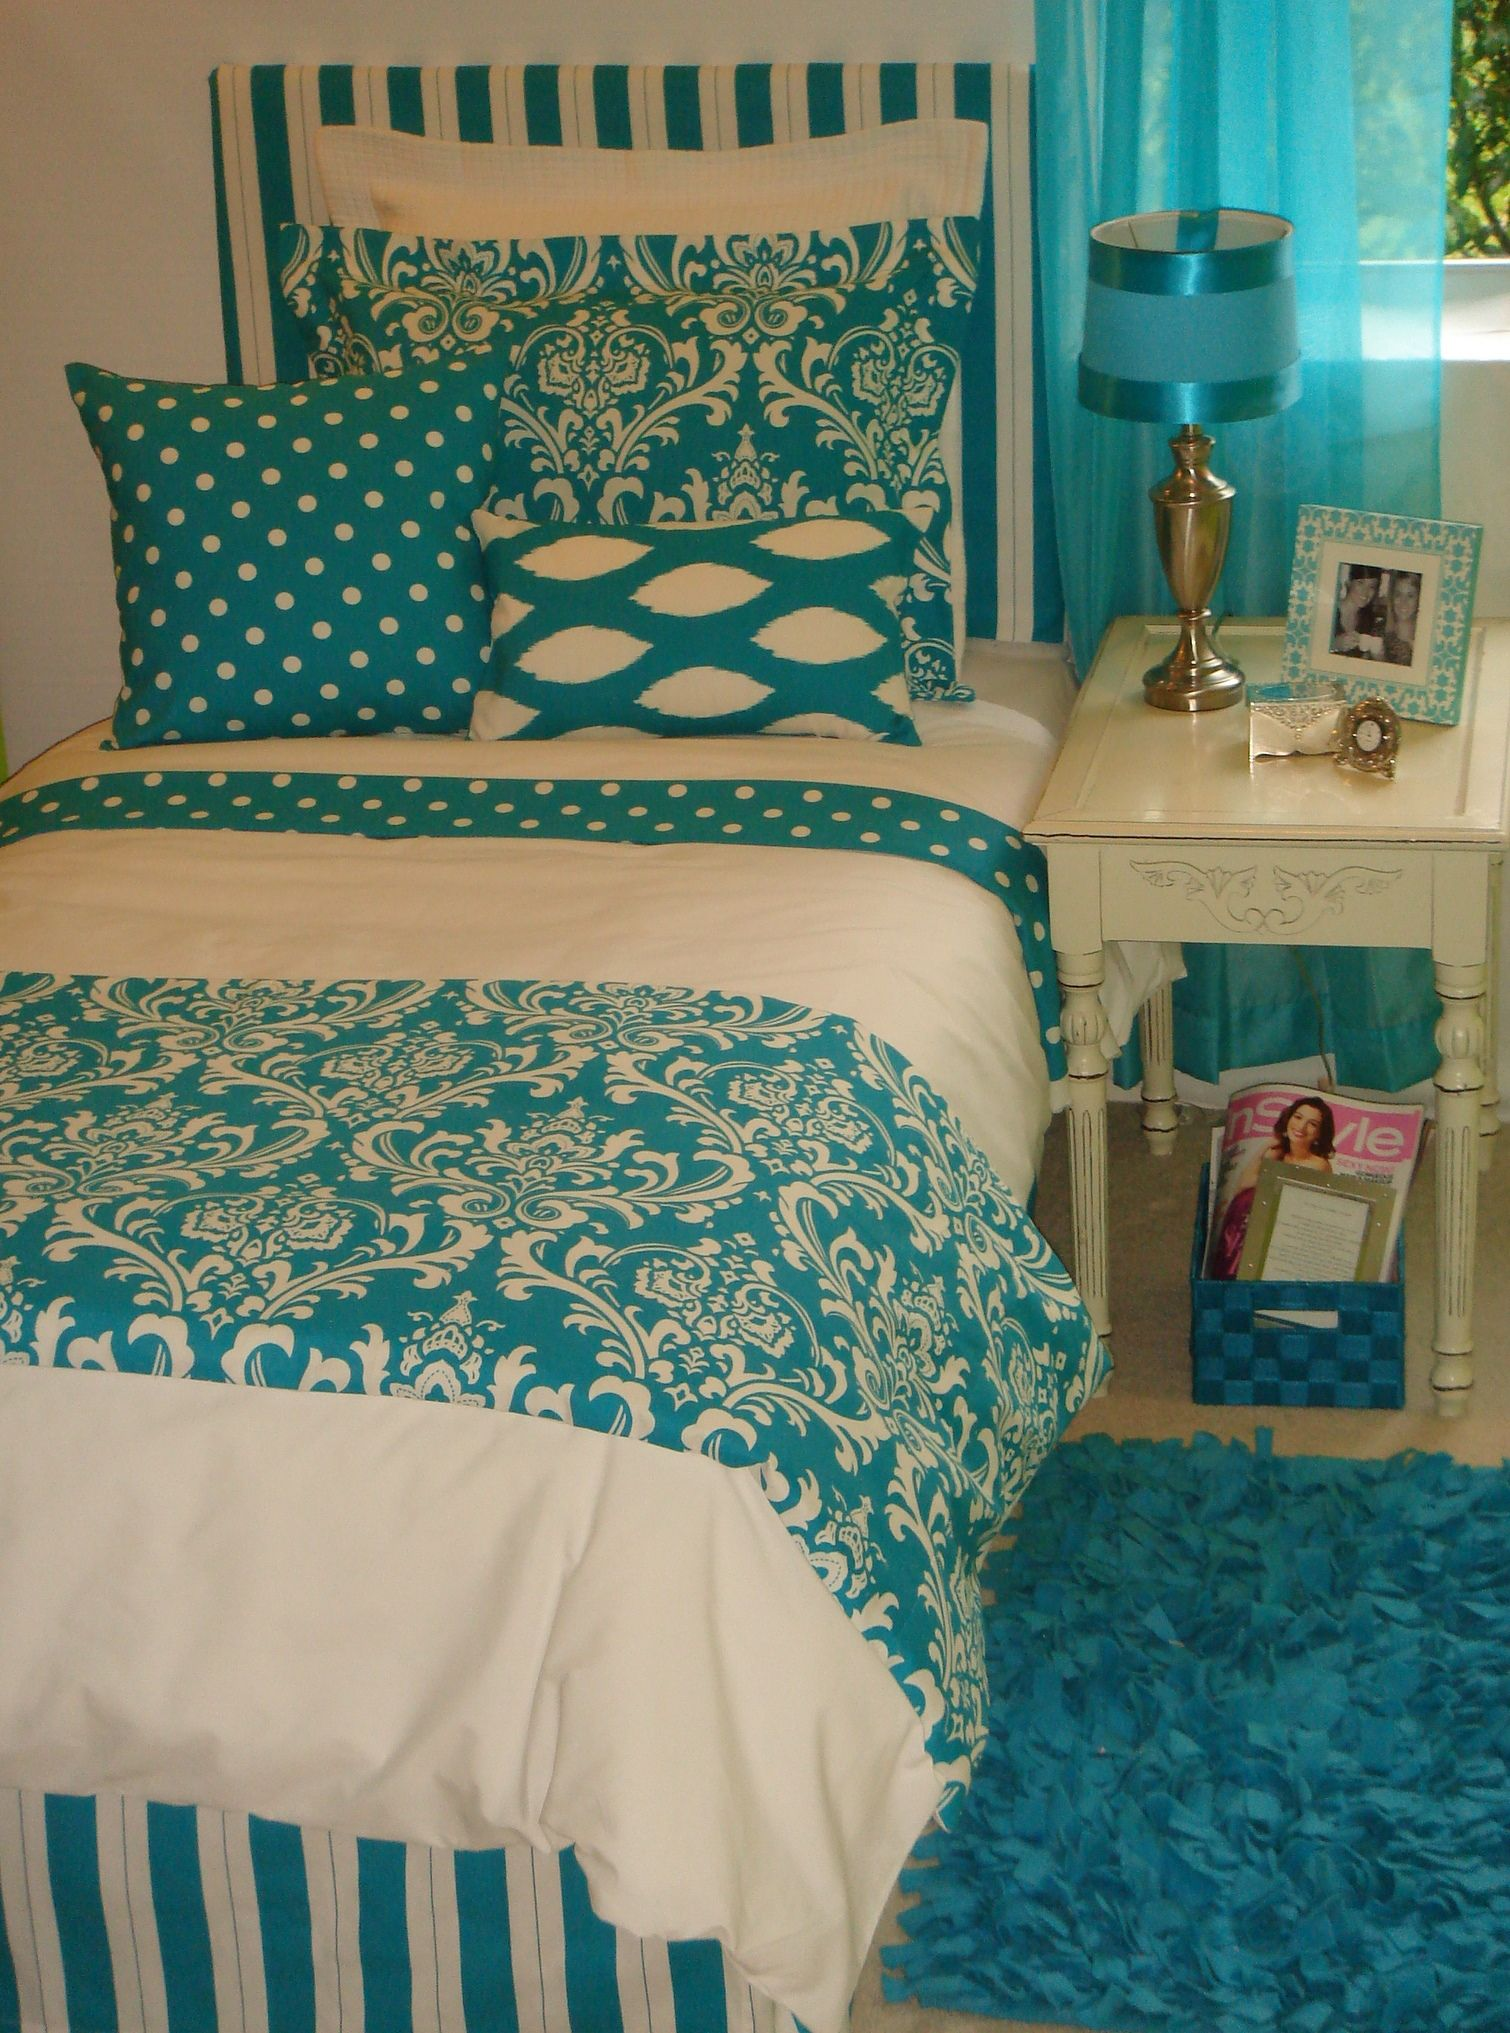 How to Choose Dorm Room Bedding: A